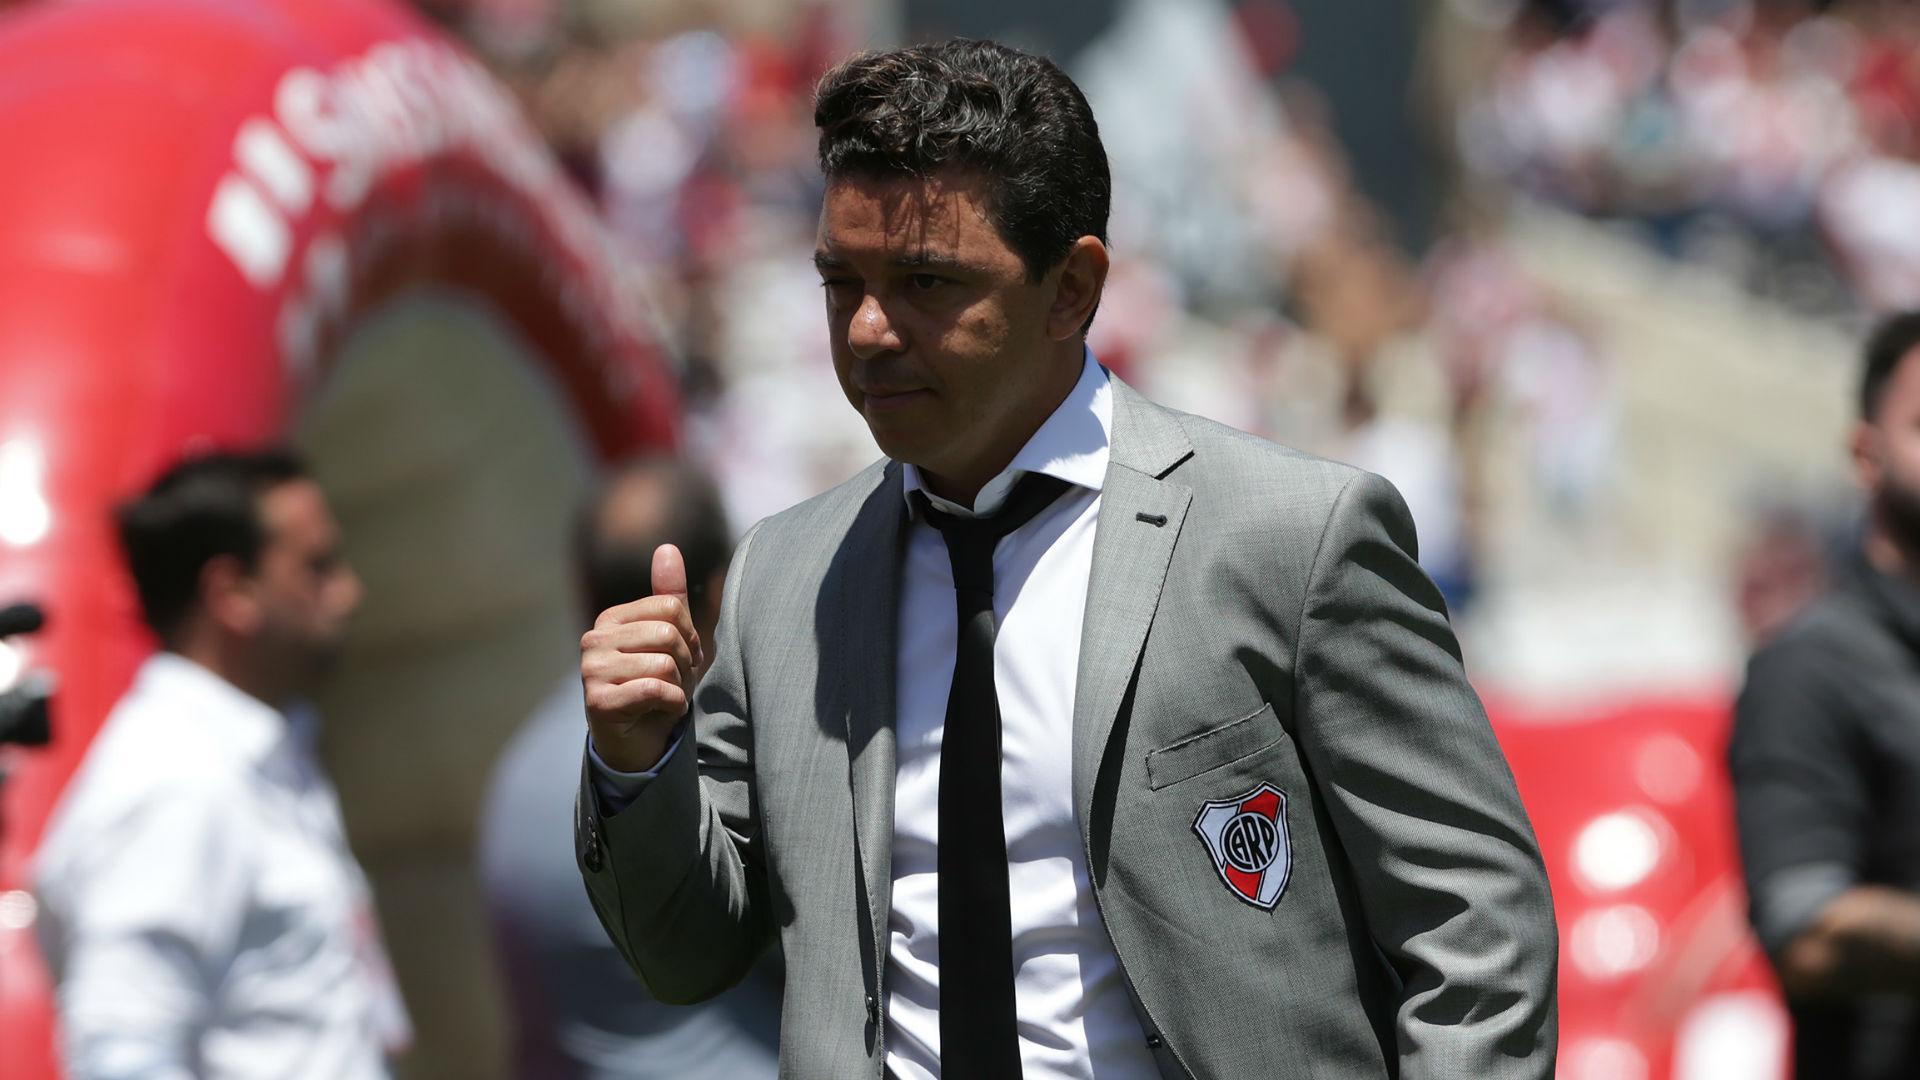 Copa Libertadores final: Back-to-back titles a perfect send-off for 'Barca bound' River boss Gallardo?